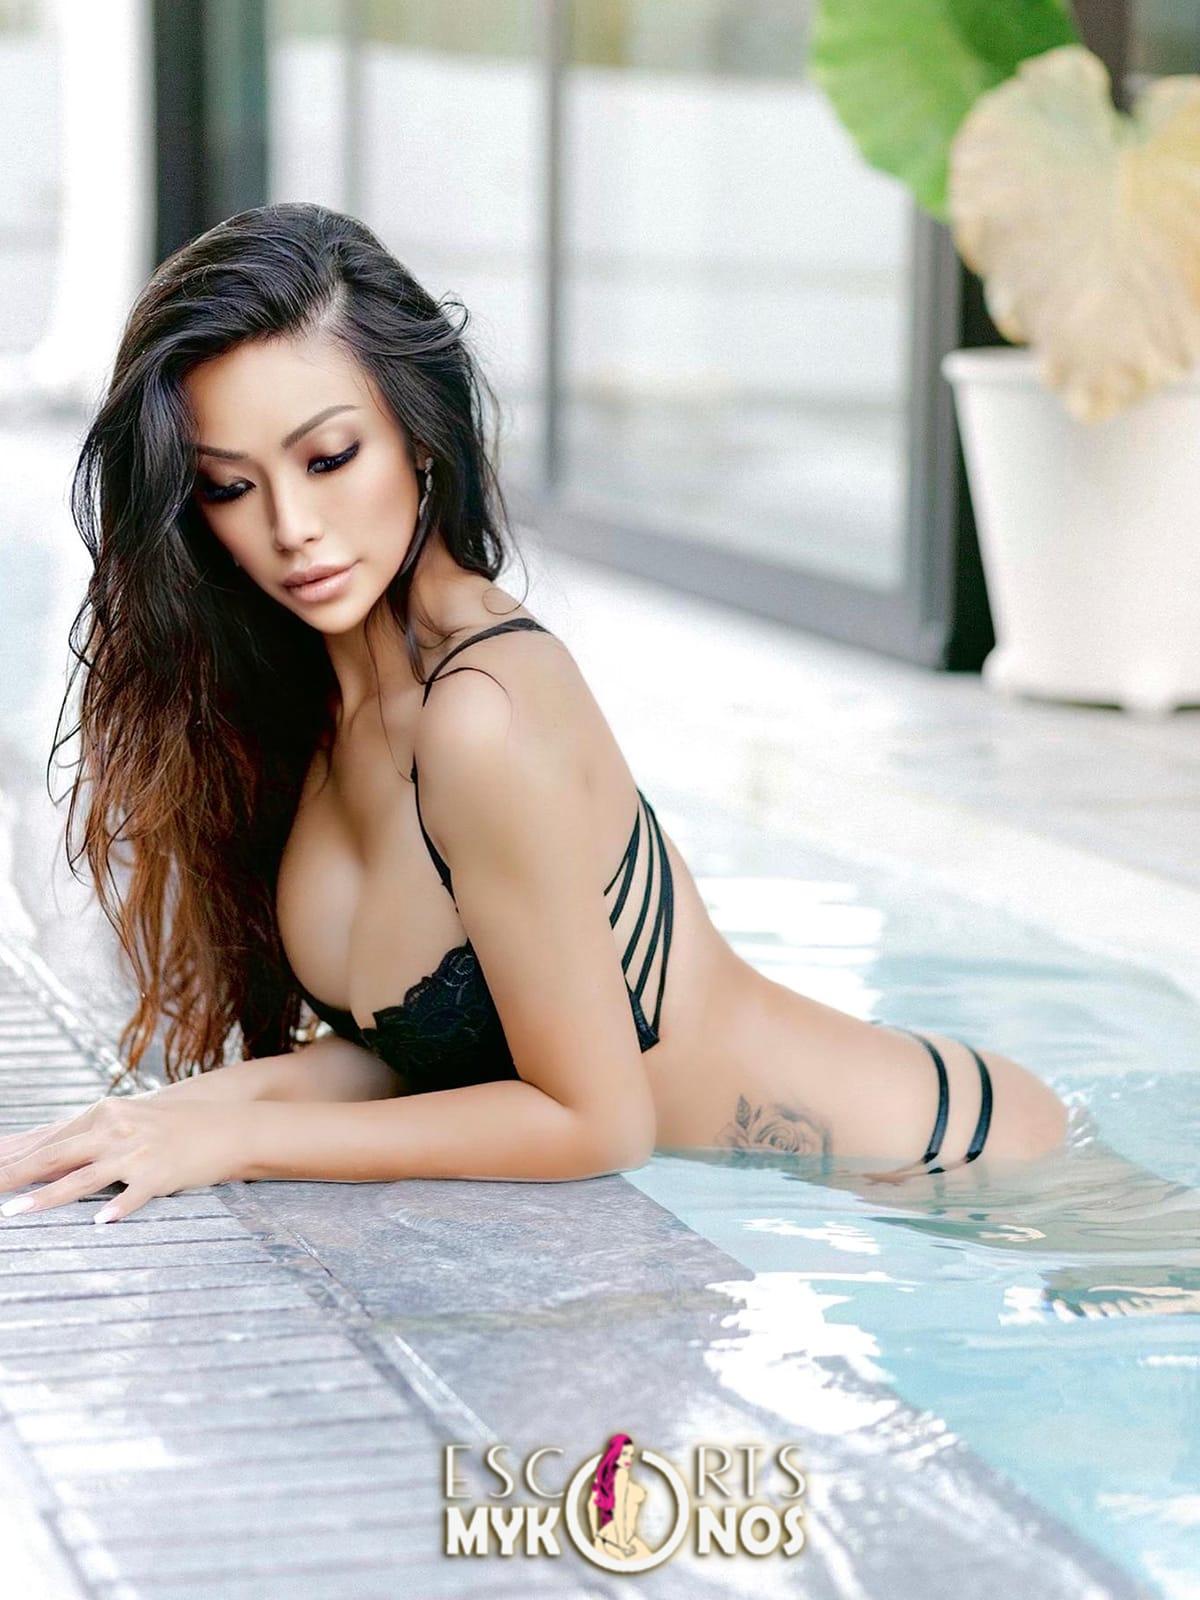 Playboy model angelina gray escort